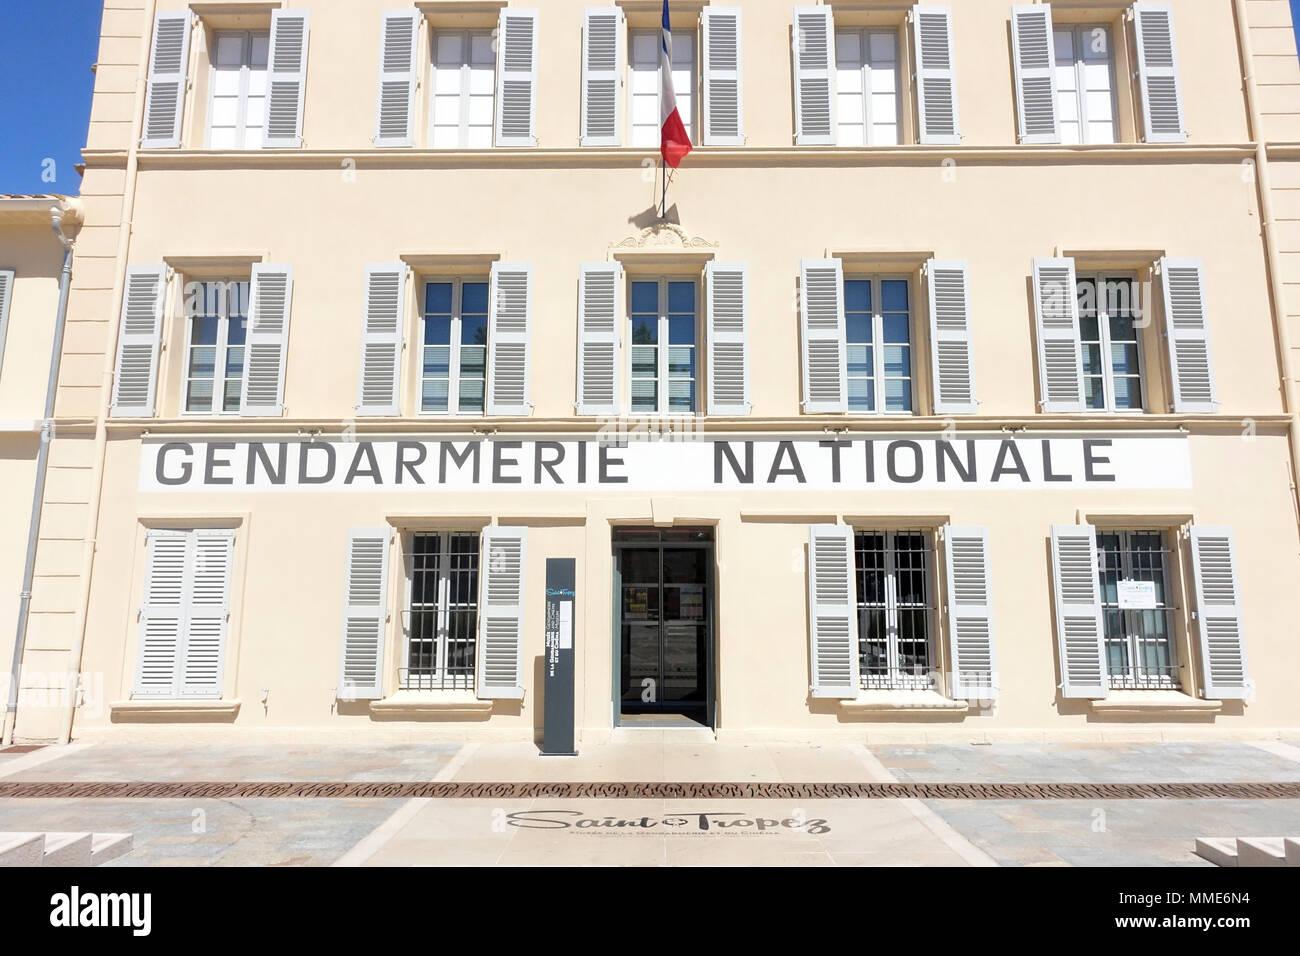 Gendarmerie Nationale of Saint-Tropez. - Stock Image